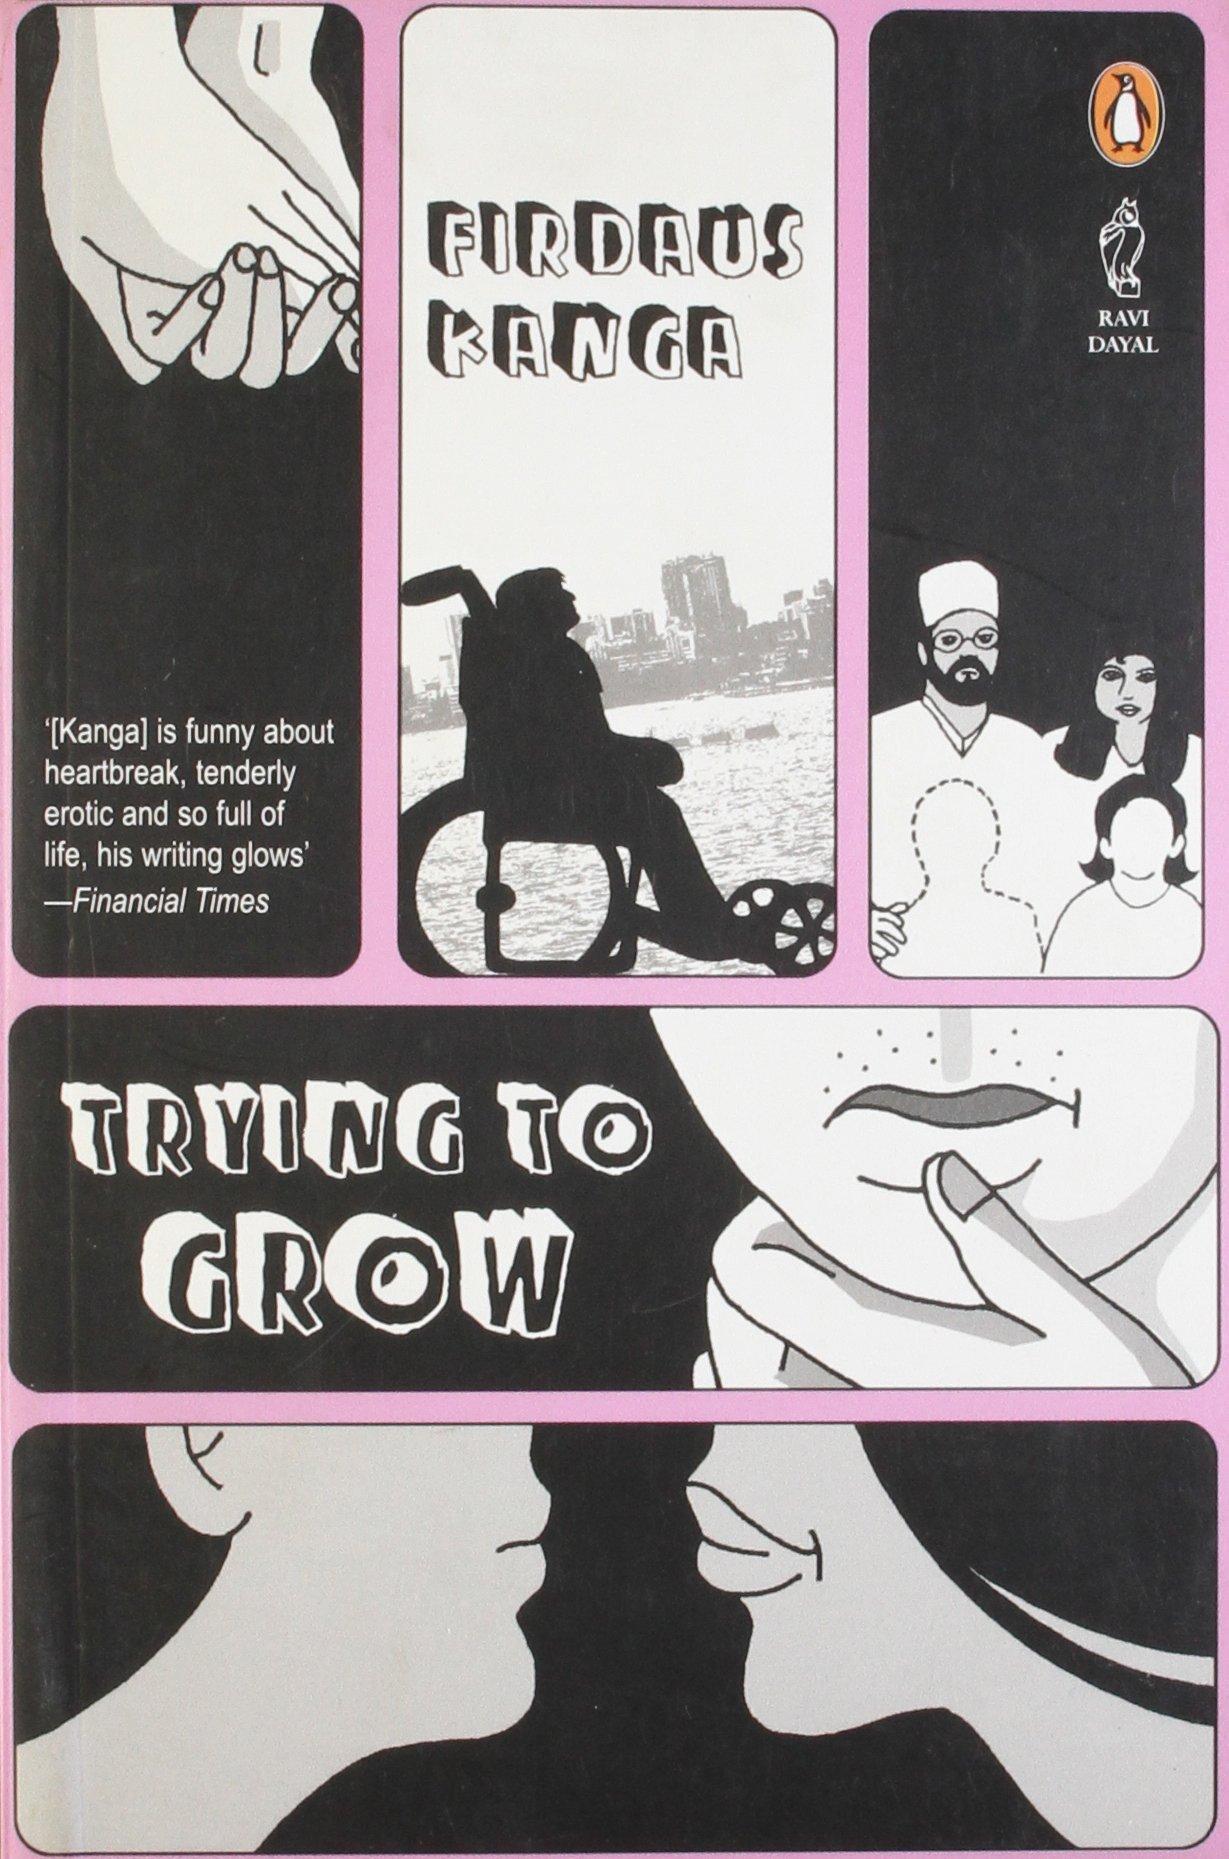 Trying To Grow by Firdaus Kanga